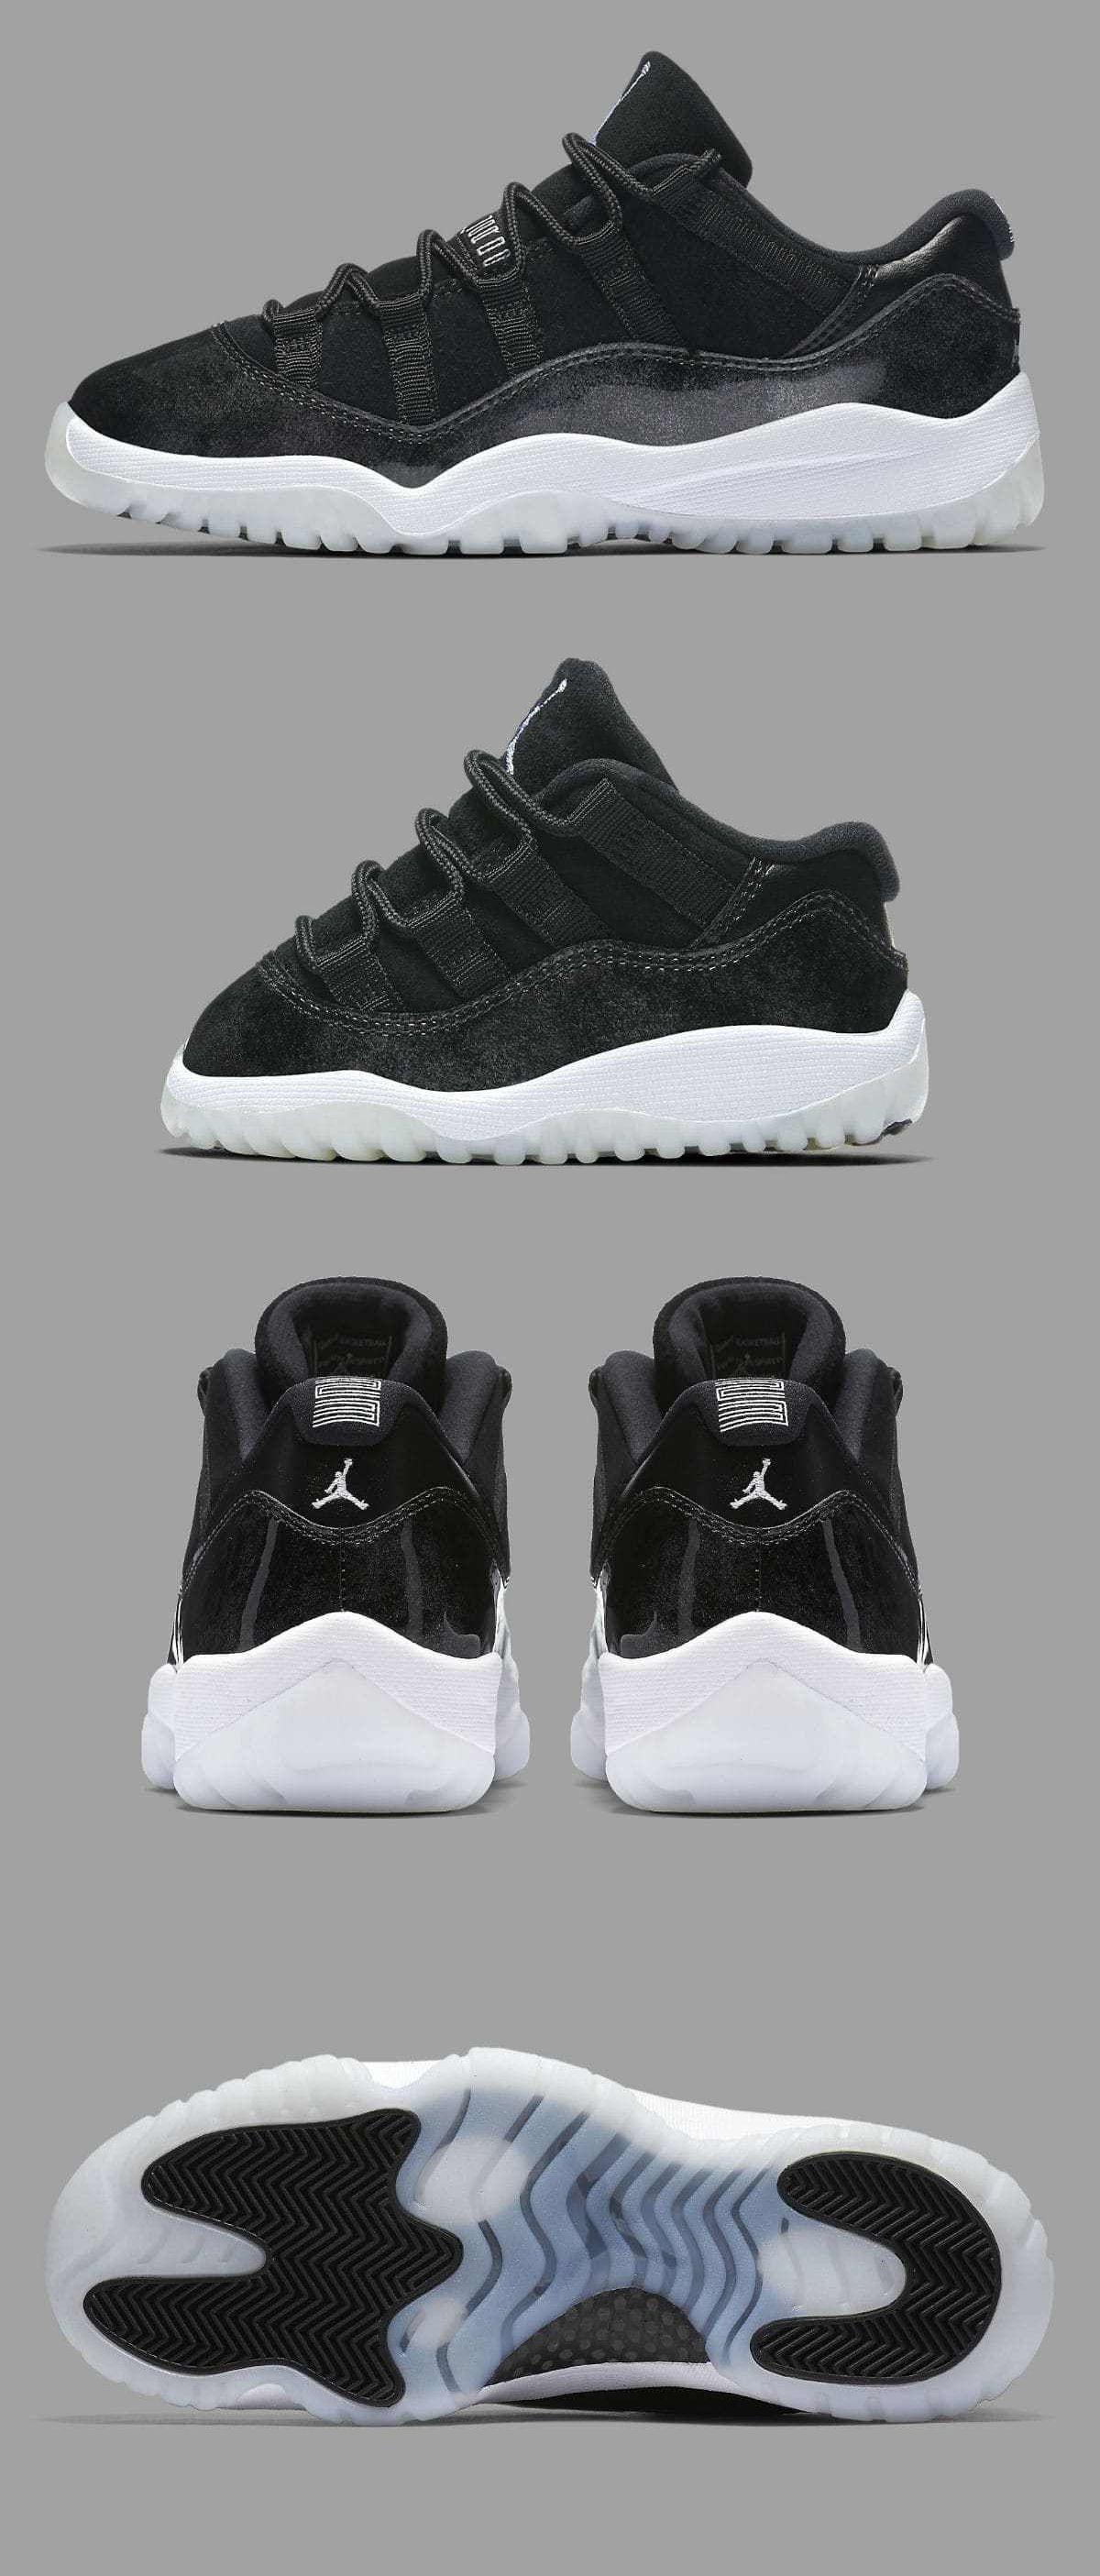 Baby Shoes Nike Air Jordan 11 Low Retro Barons Black White